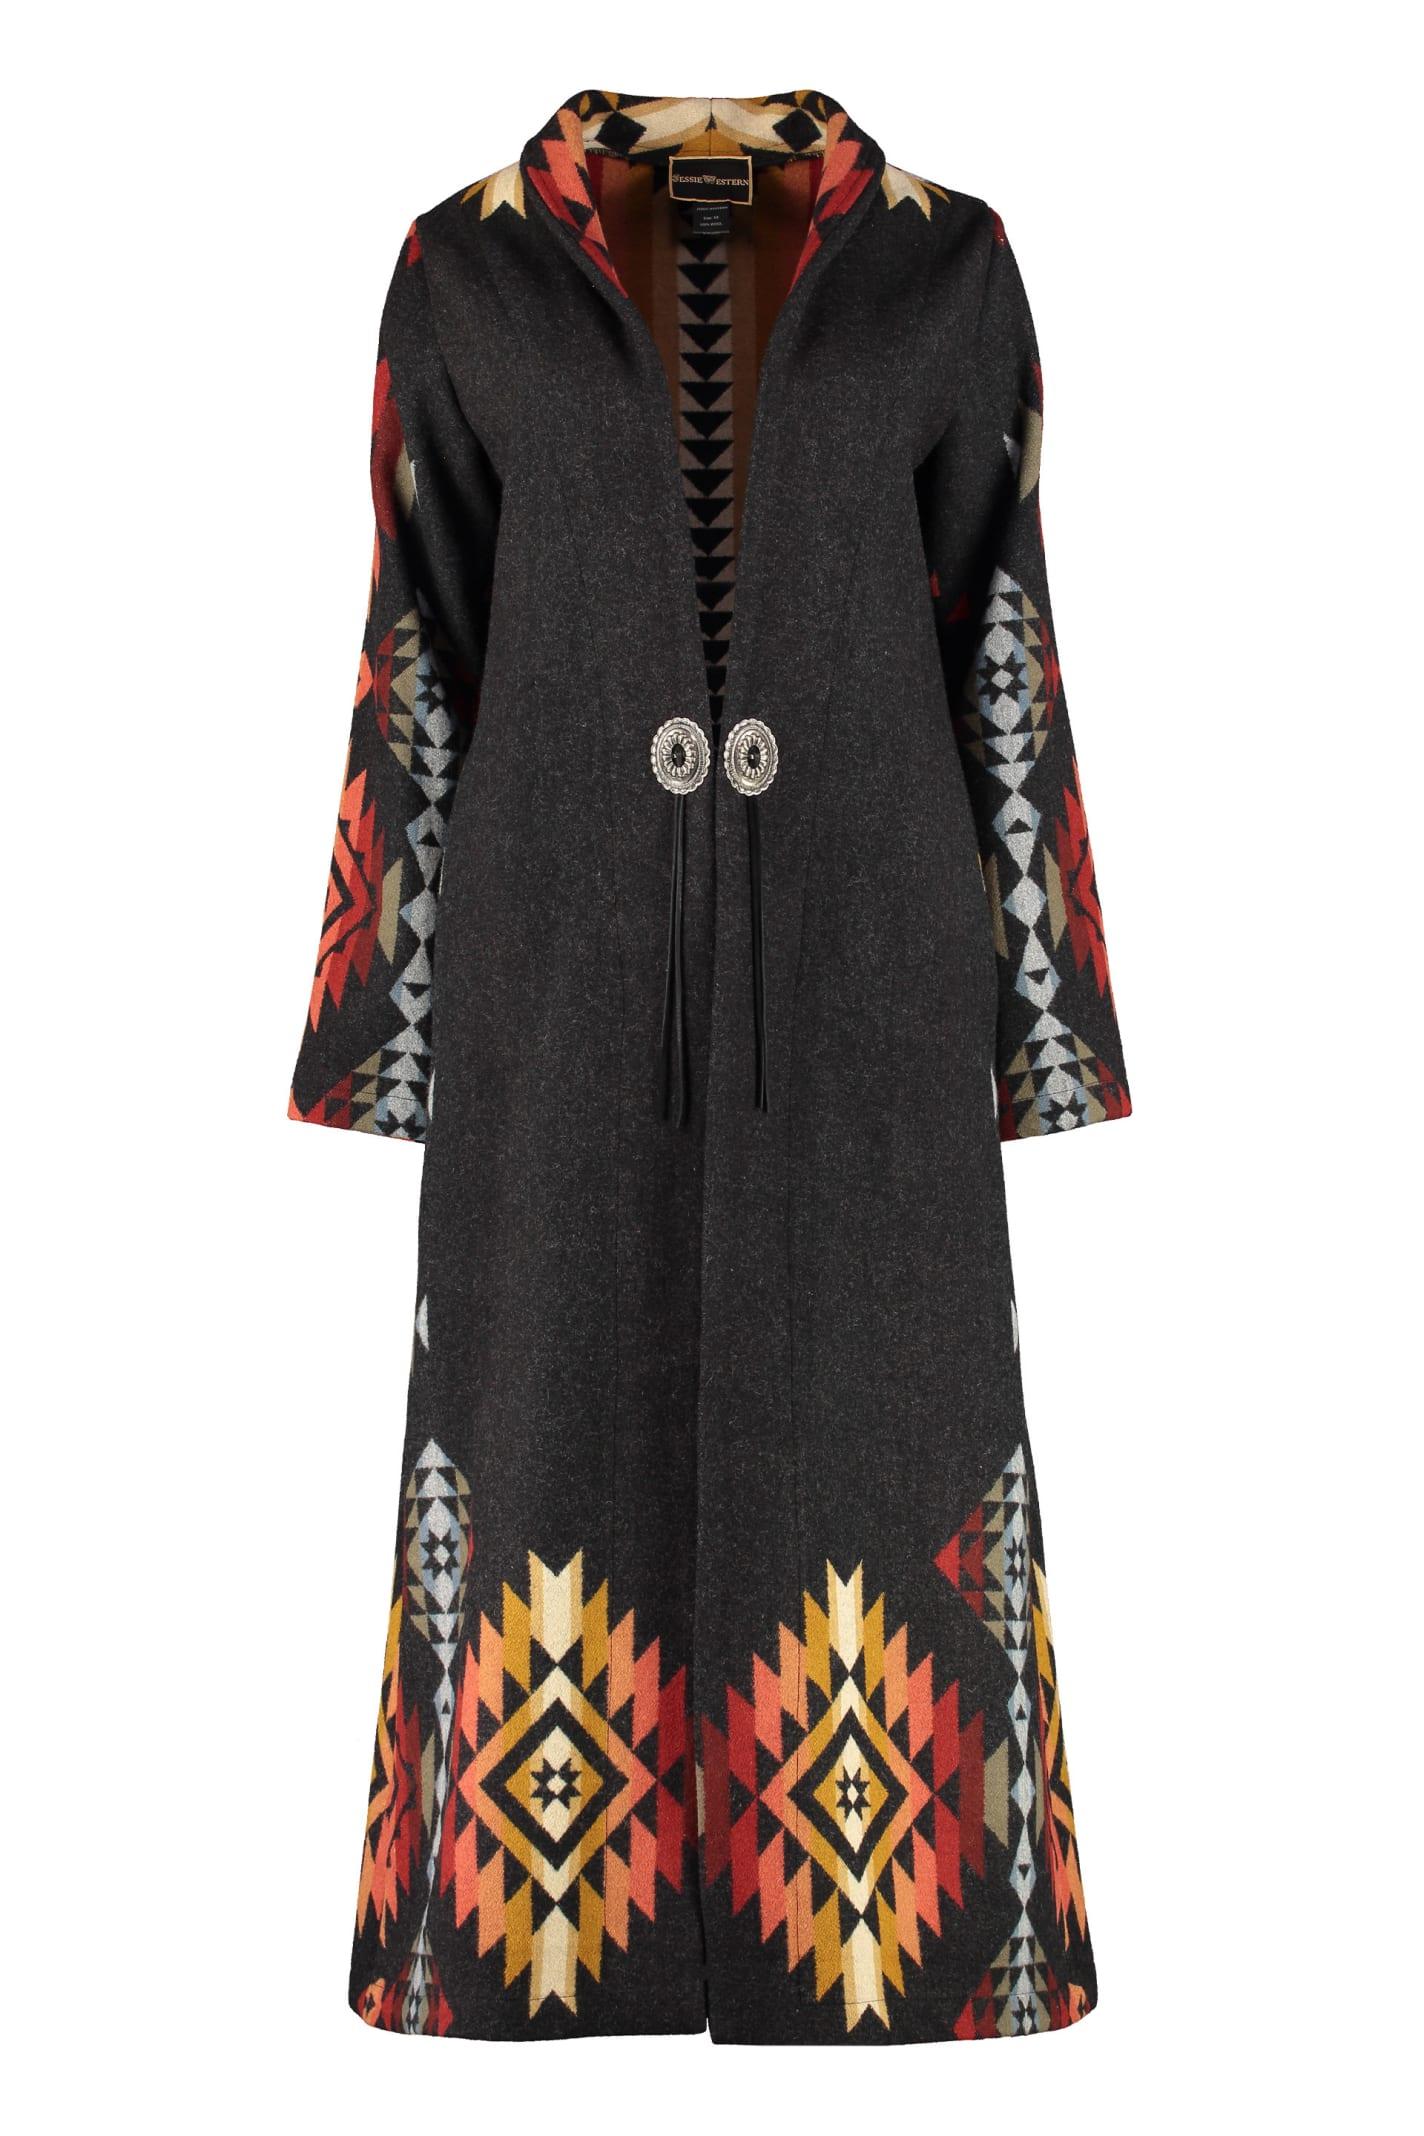 Jessie Western Pueblo Wool Long Coat